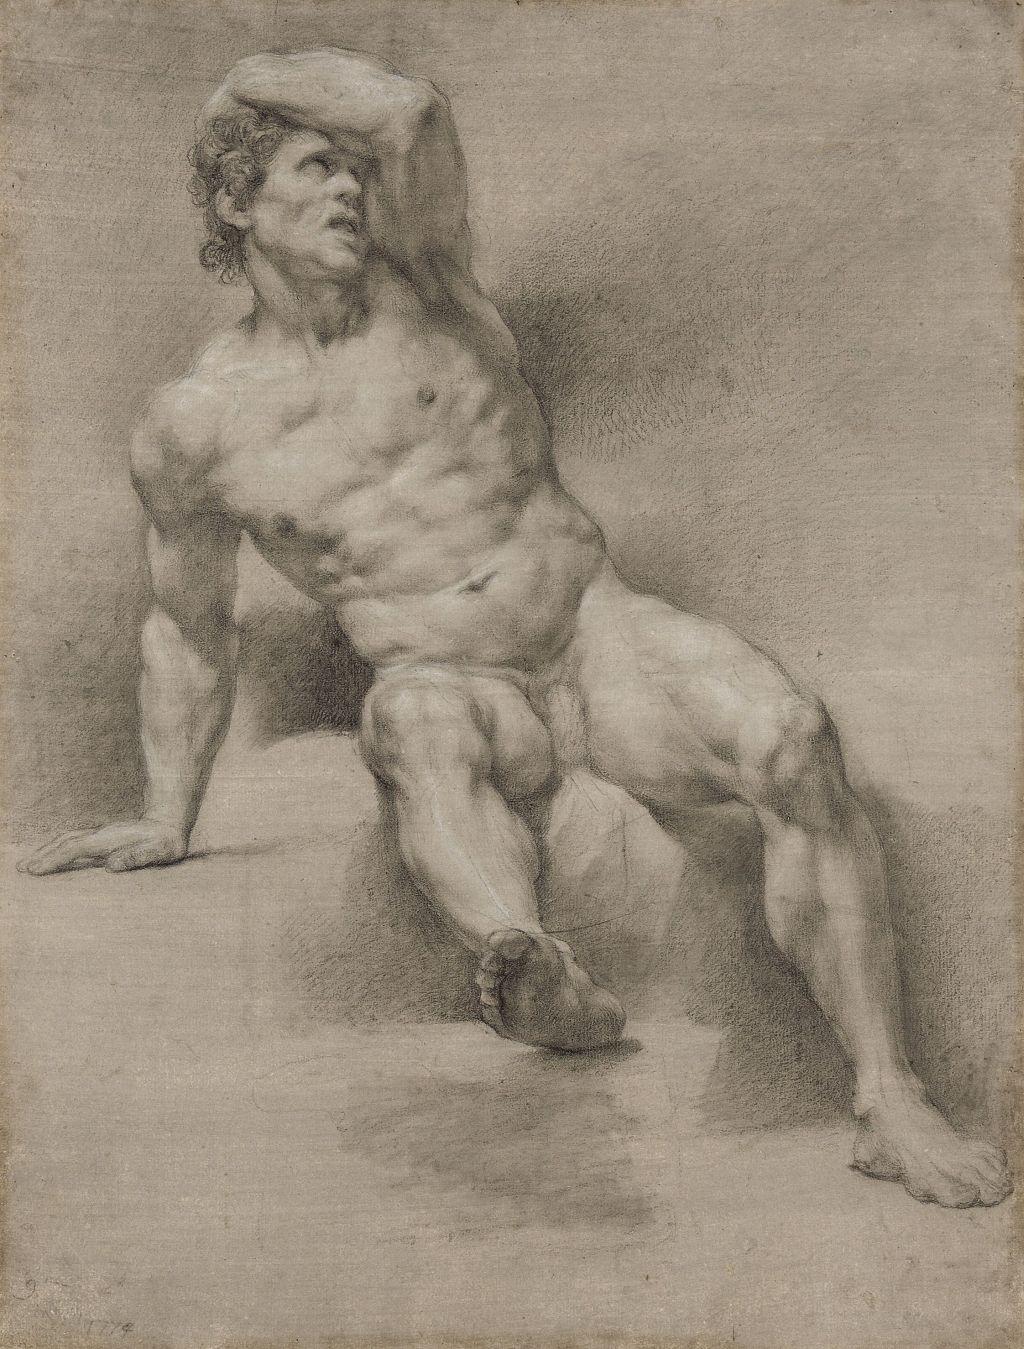 Nu masculí, Anton Rafael Mengs